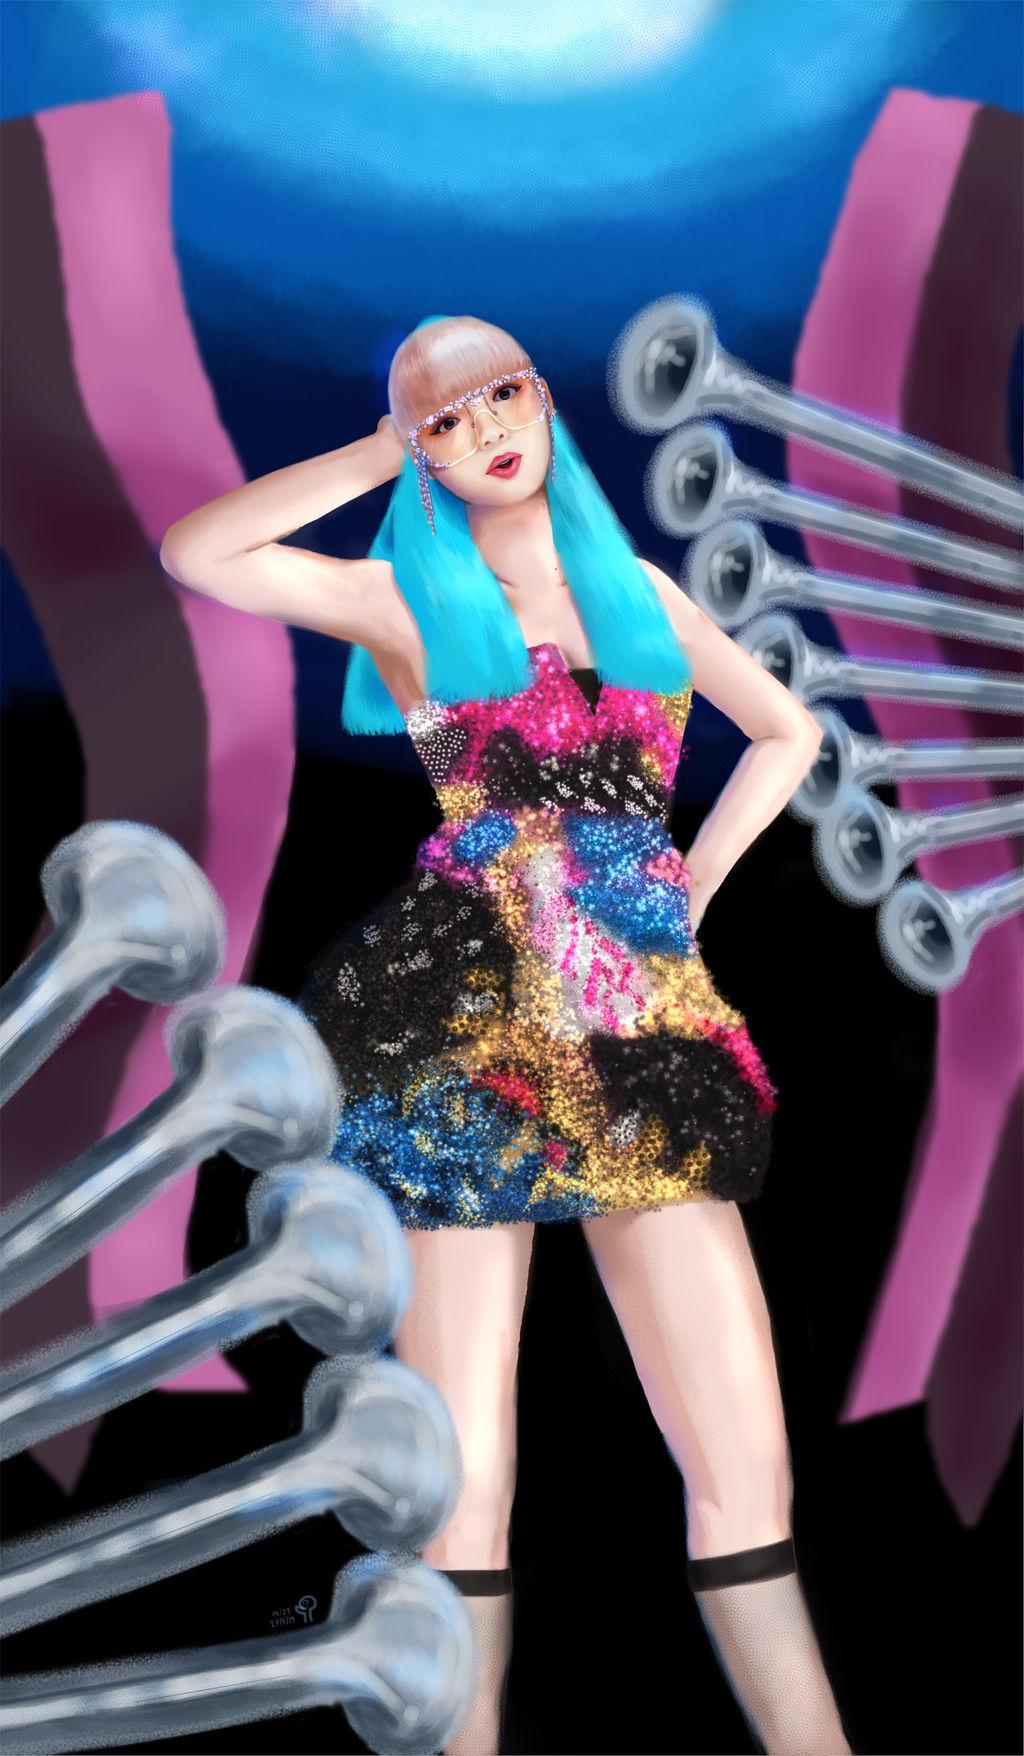 Fan Art Lisa Blackpink Kill This Love By Makikingdom On Deviantart